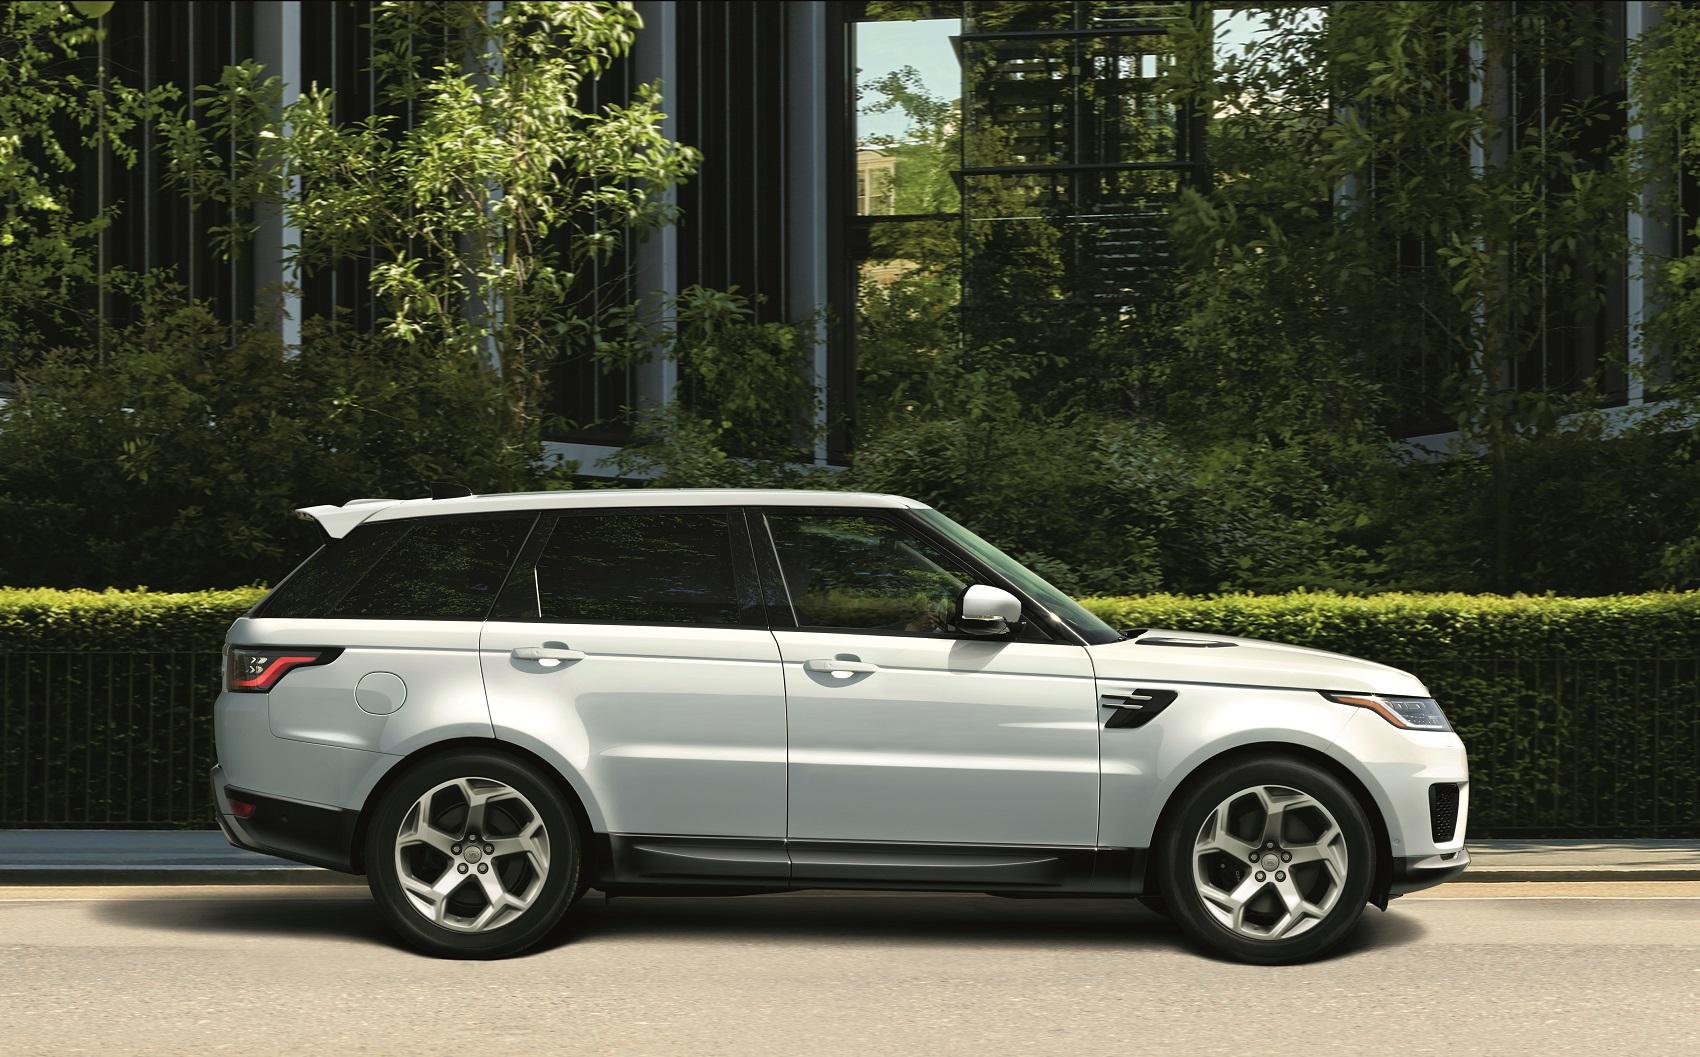 Range Rover Sport HSE Trim